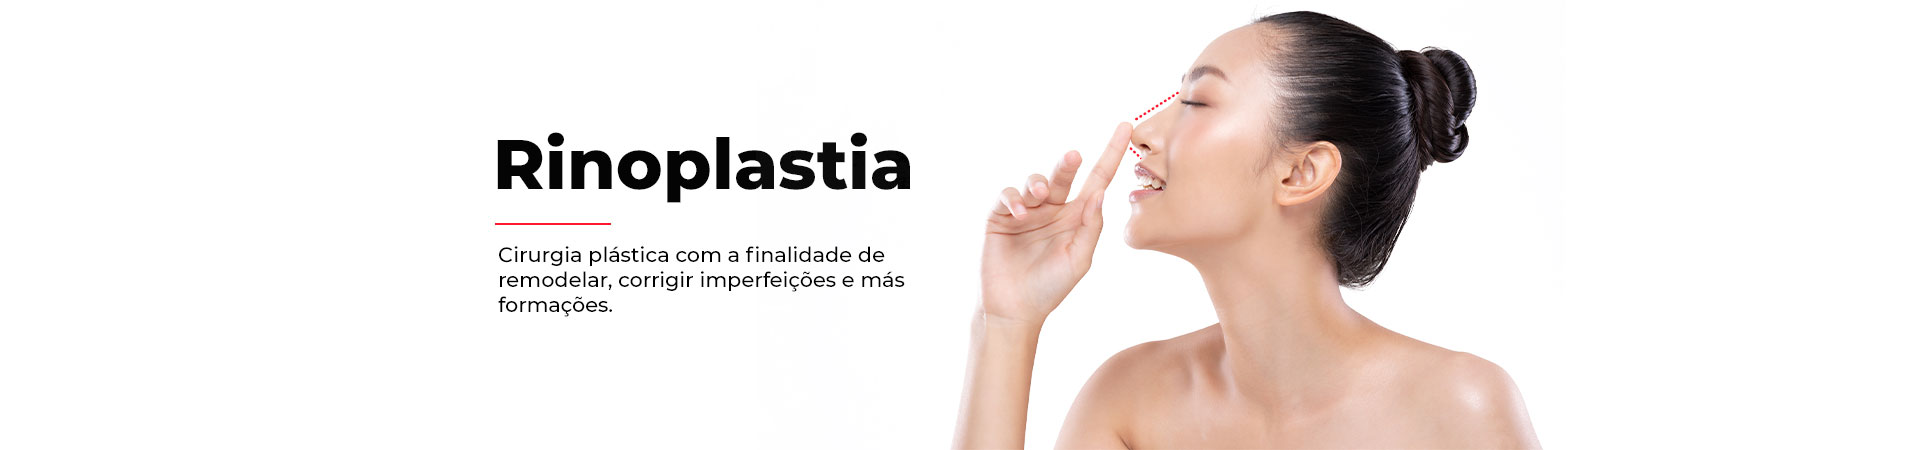 Rinoplastia-3